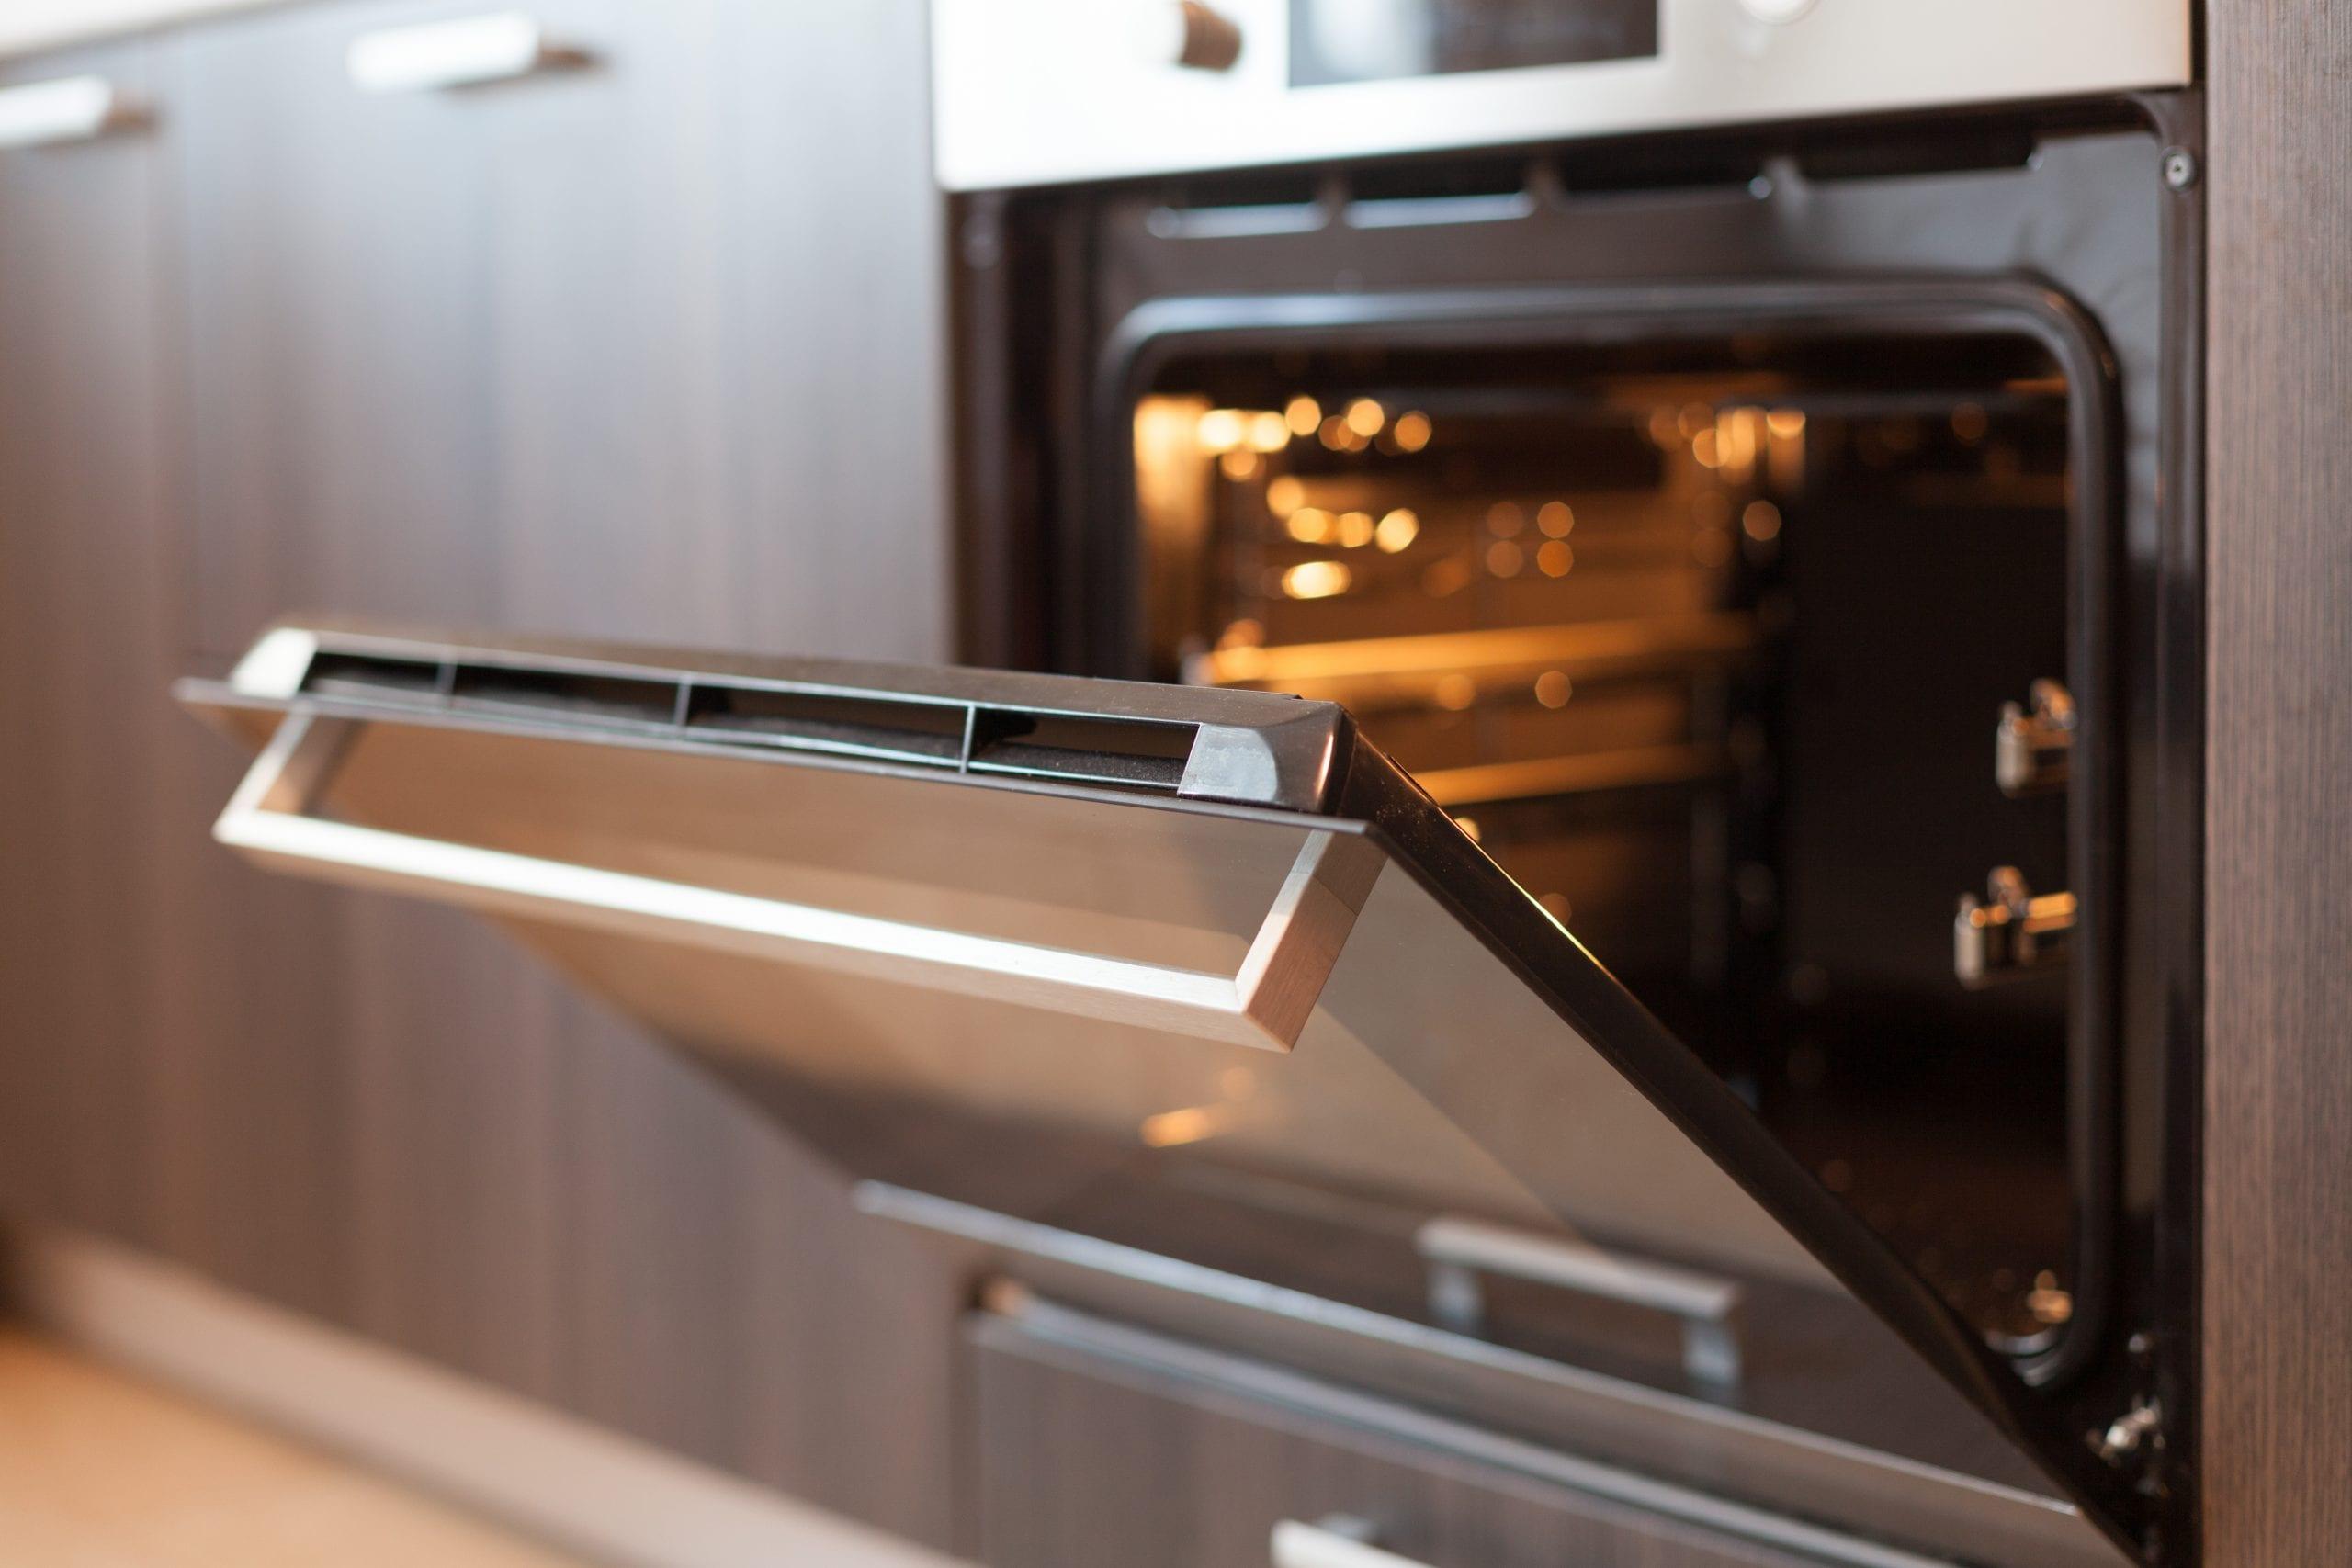 Heating Kombucha With Oven Light